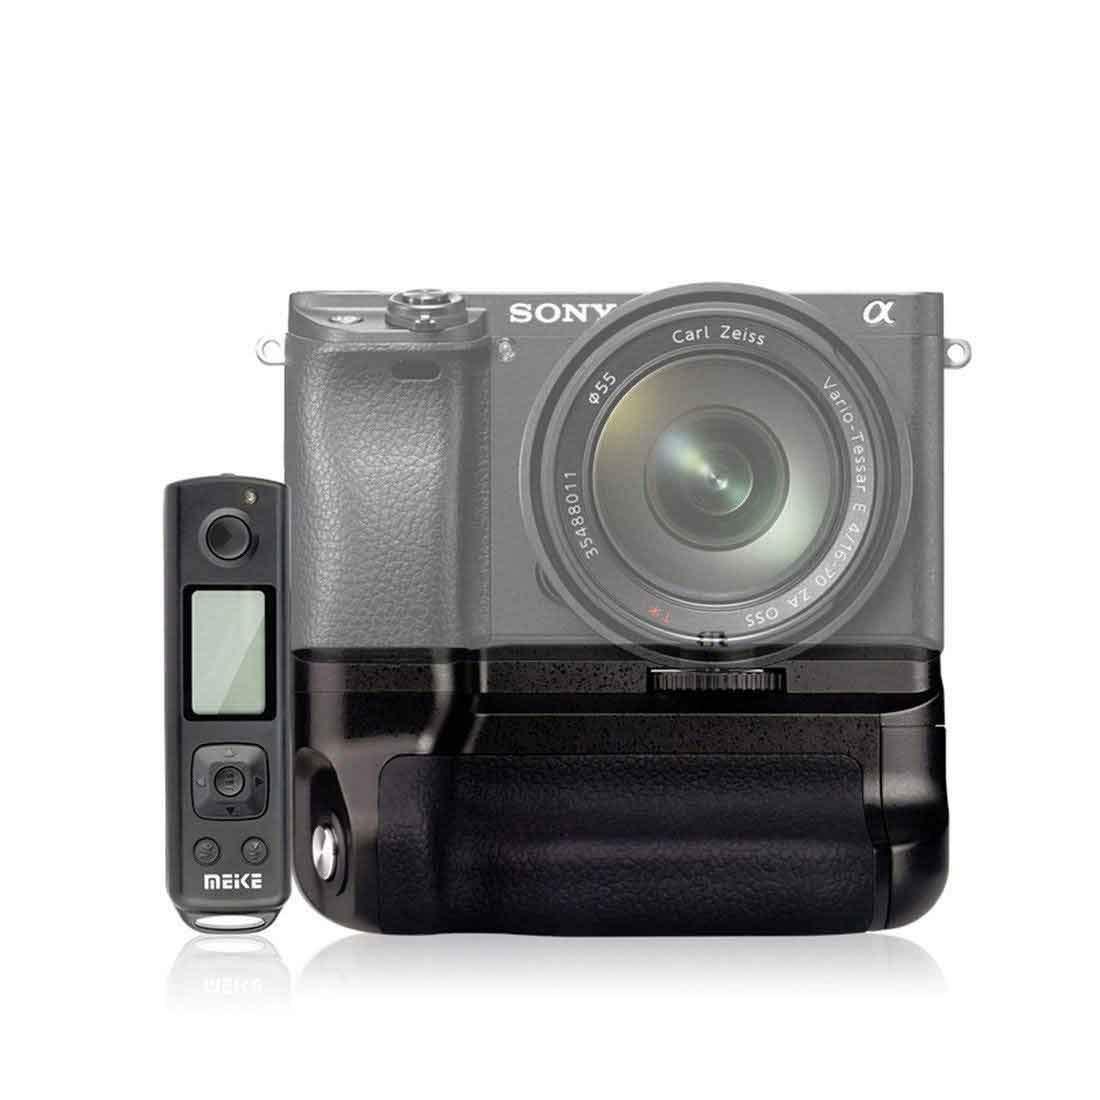 MeiKe MK-320 TTL LCD Mini Hot Shoe Flash Speedlight Sony Mi A7II A58 A7RII A7S NEX-6 A6000 DSRL Cameras MKSA-S320